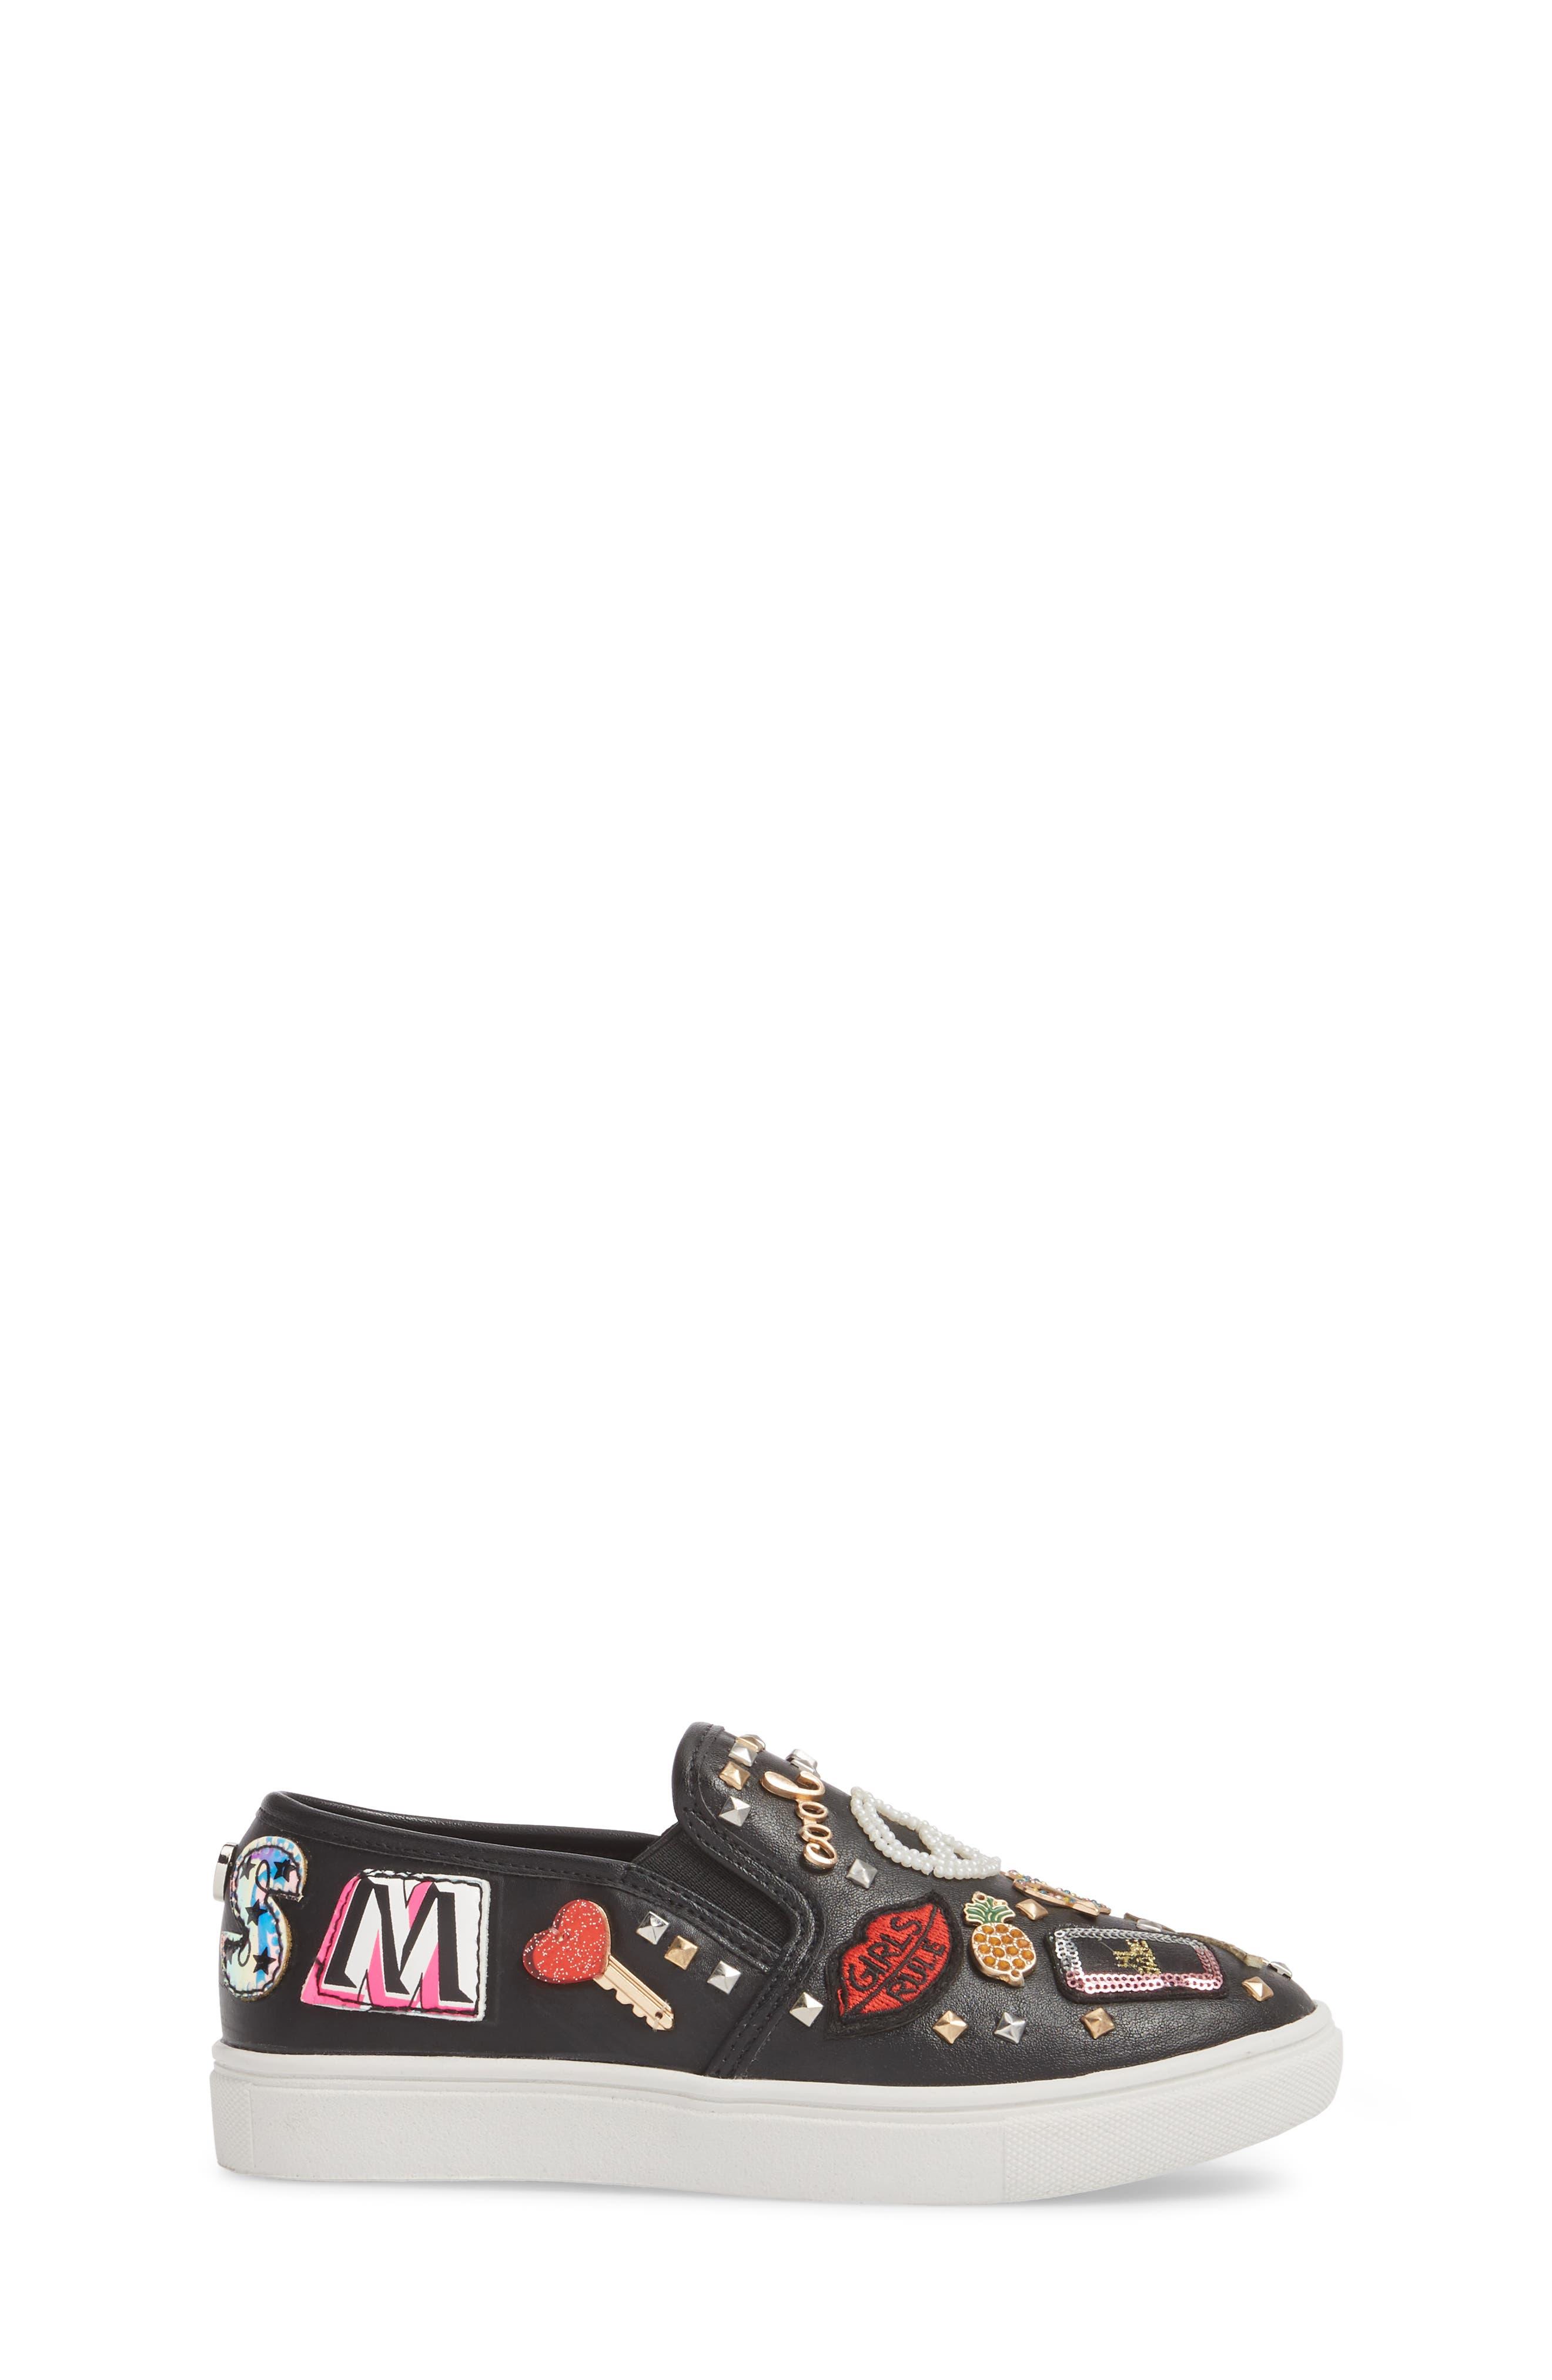 JCraze Embellished Slip-On Sneaker,                             Alternate thumbnail 3, color,                             Black